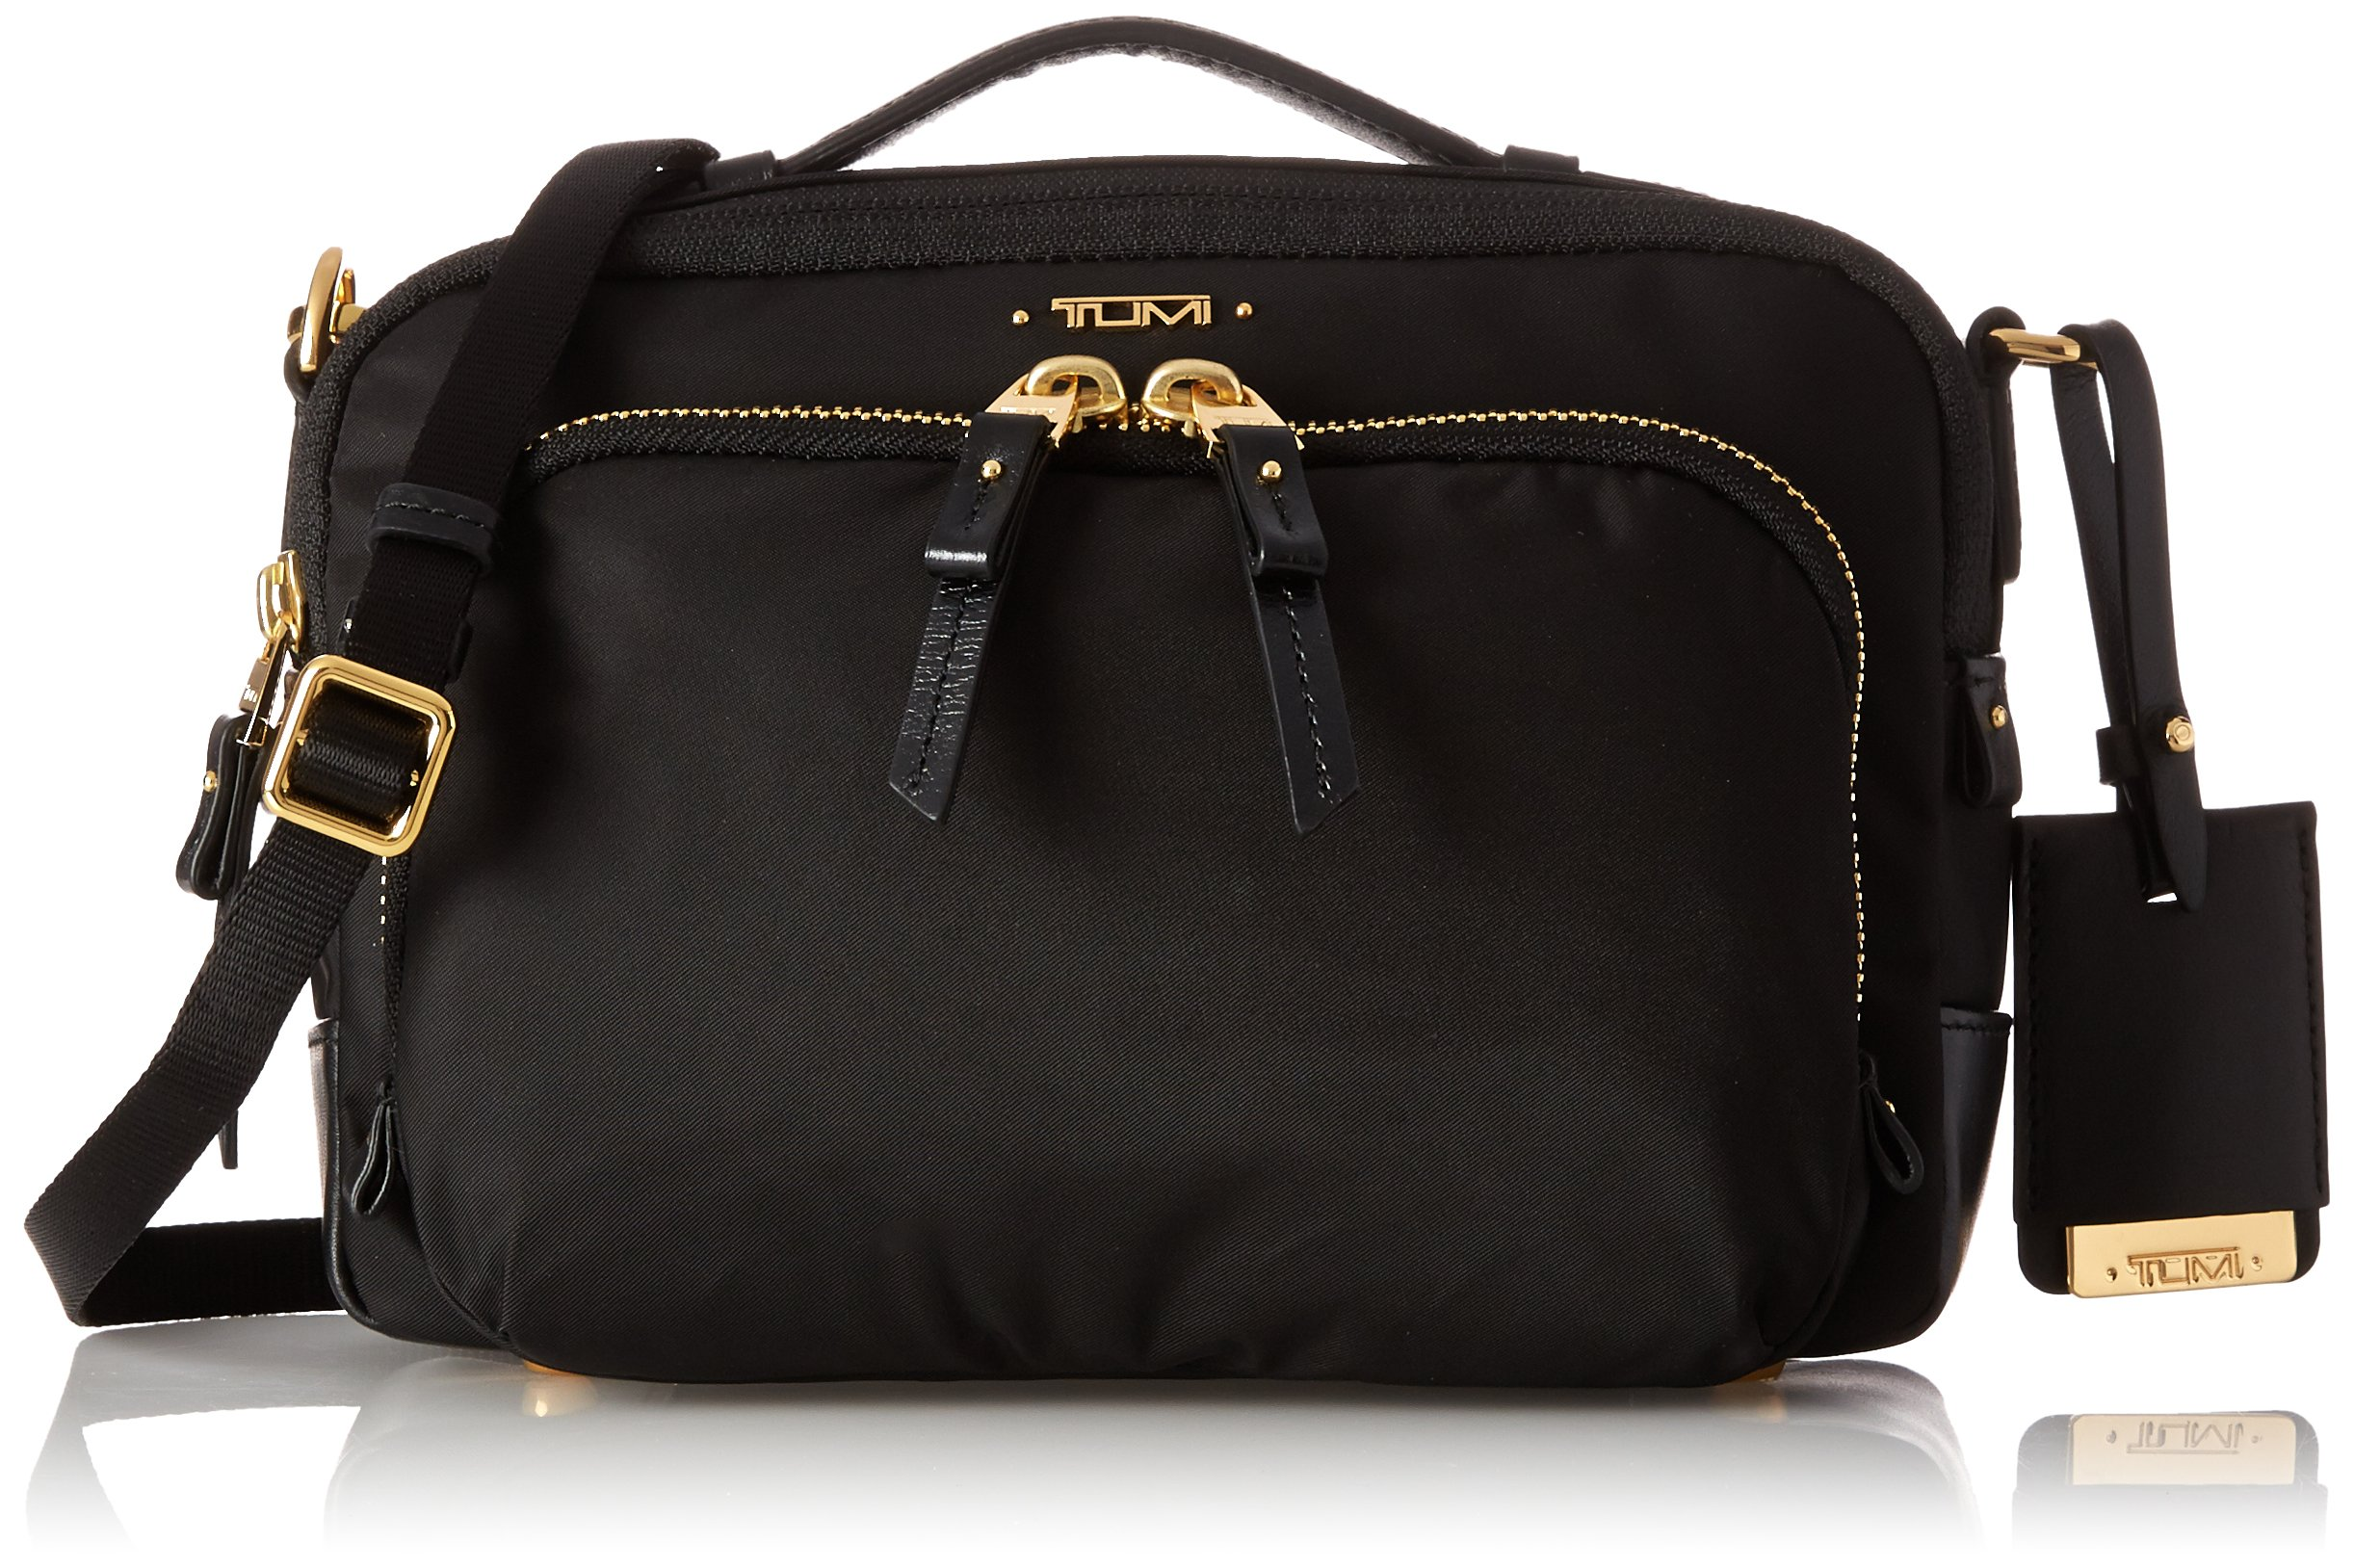 Tumi Voyageur Luanda Flight Bag, Black, One Size